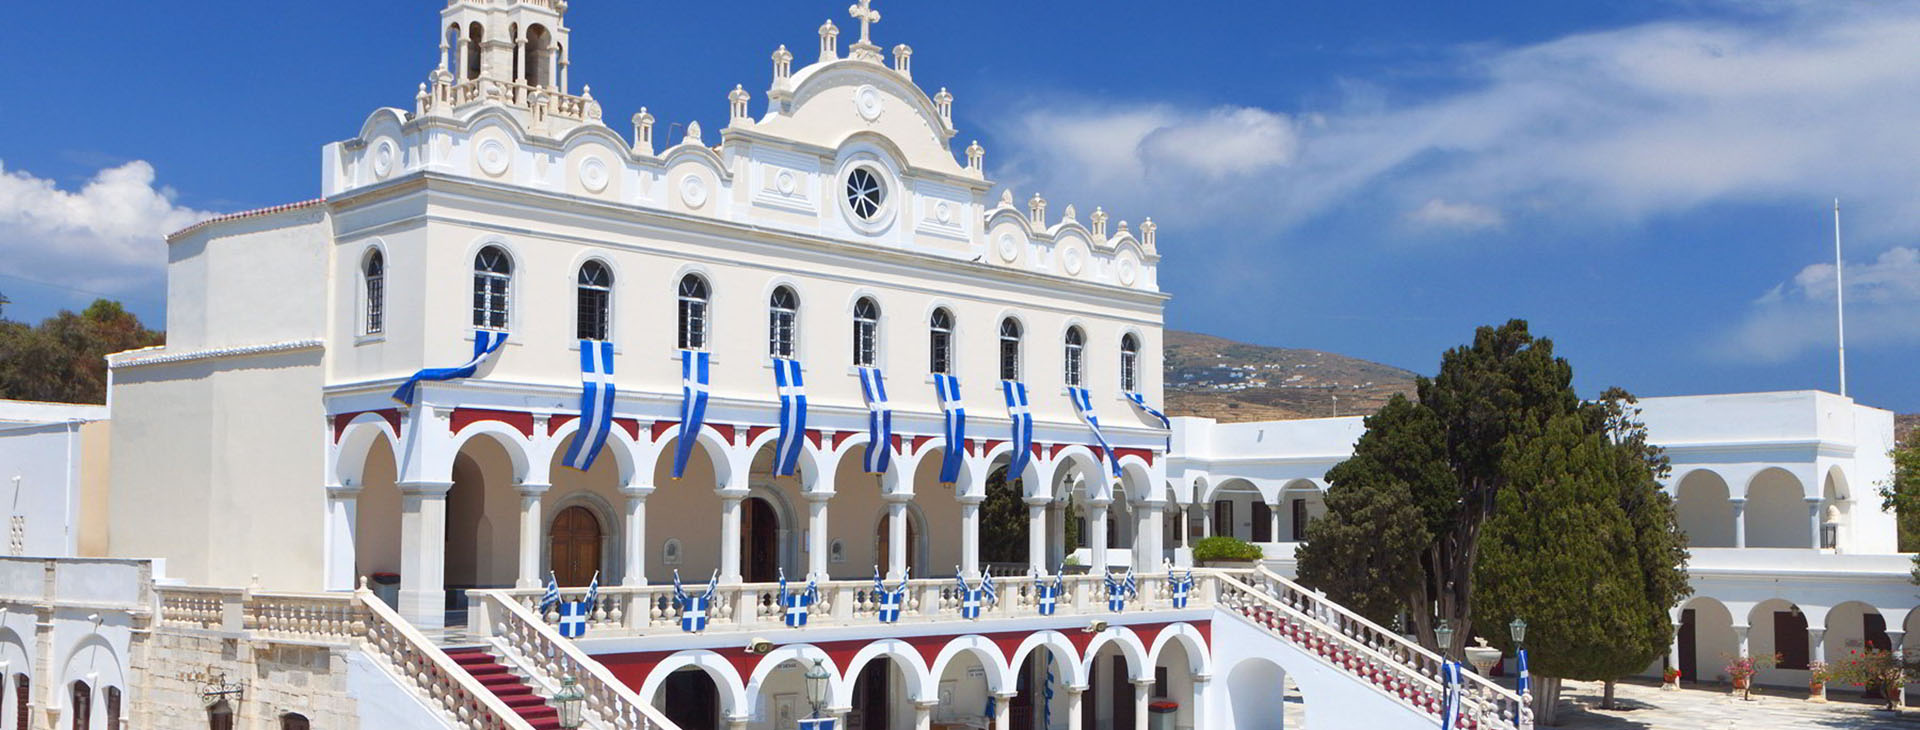 Panagia Evangelistria, landmark of the island, Tinos island